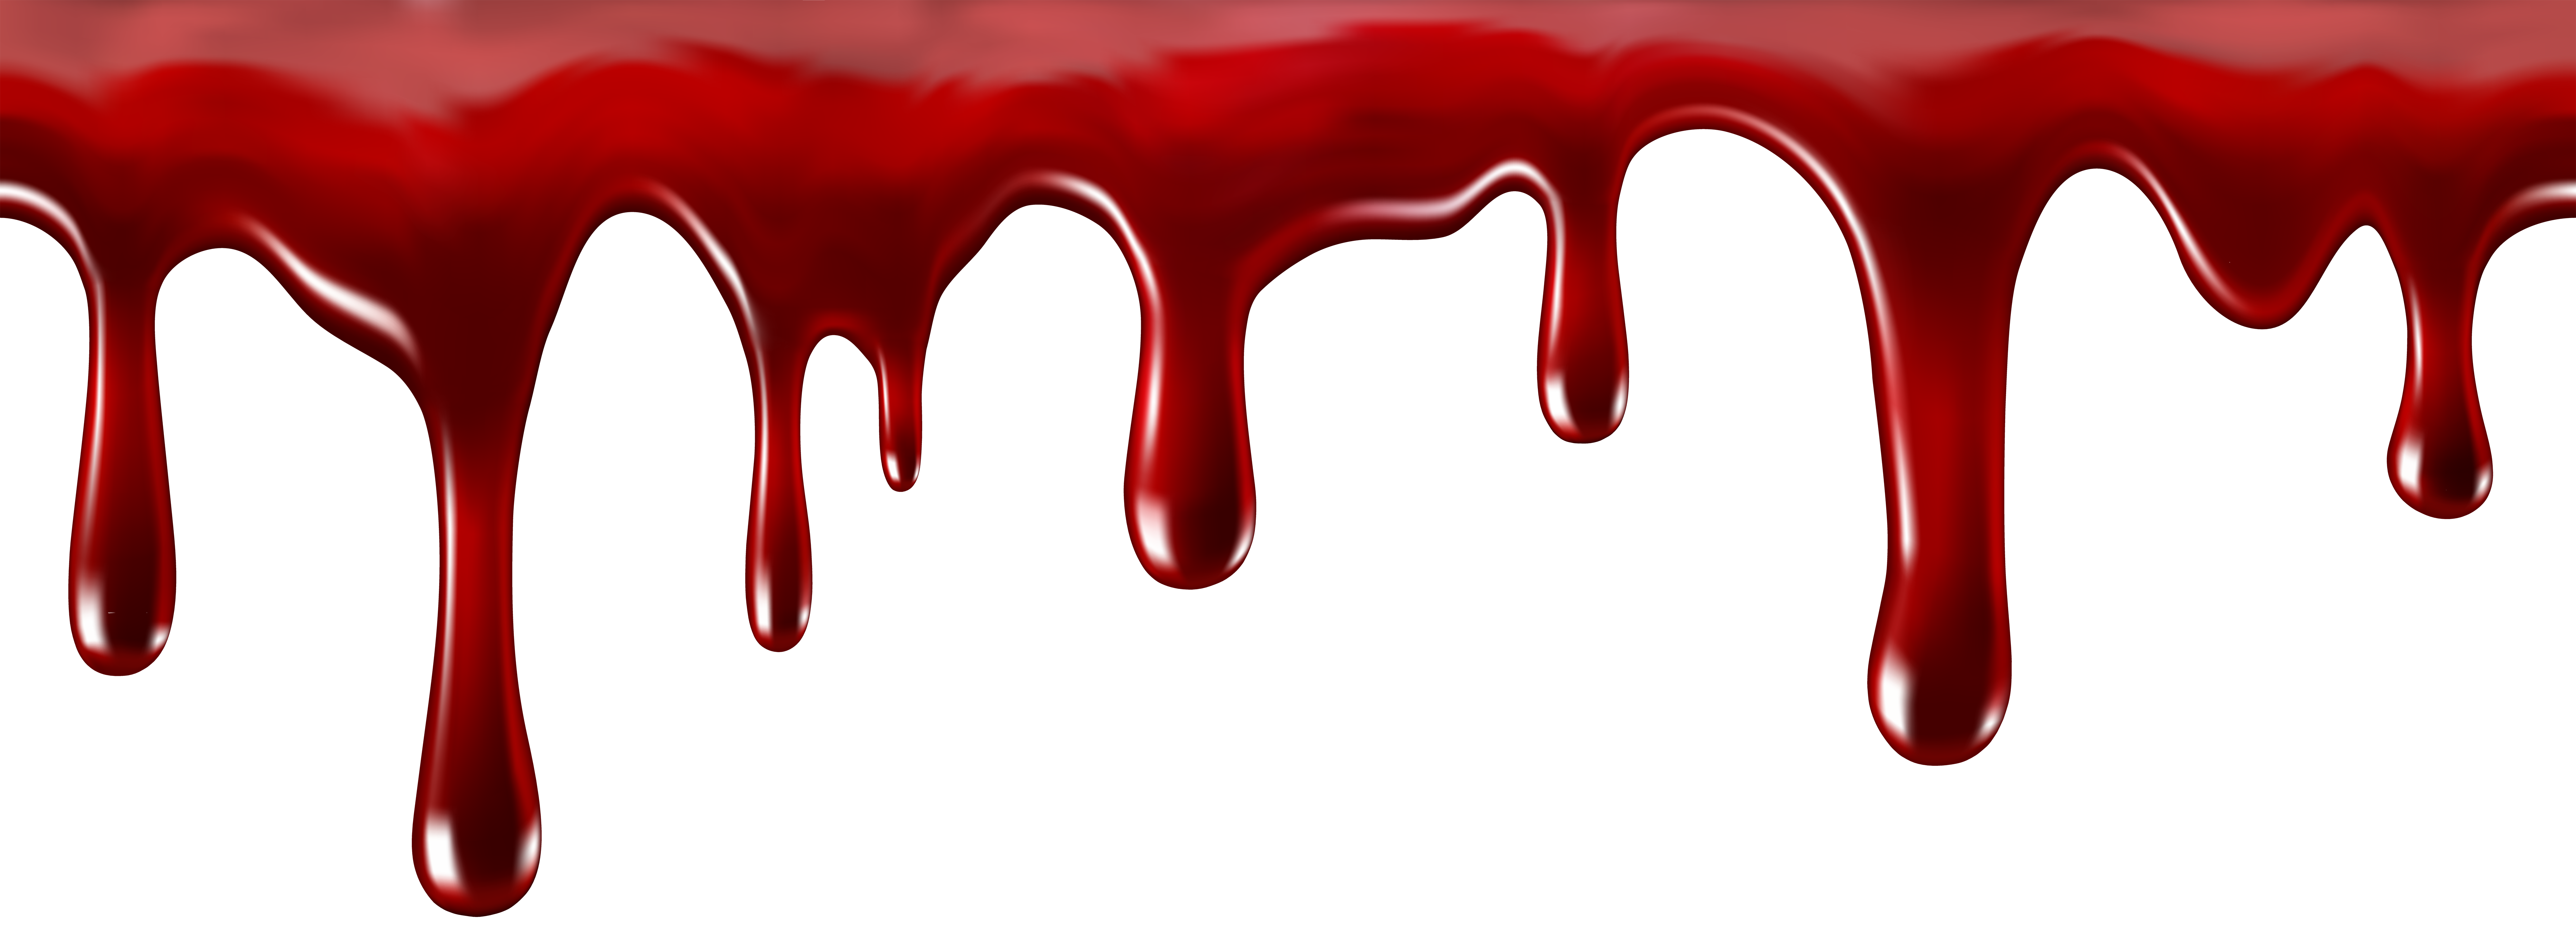 8000x2910 Clip Art Blood, Free Clip Art Blood